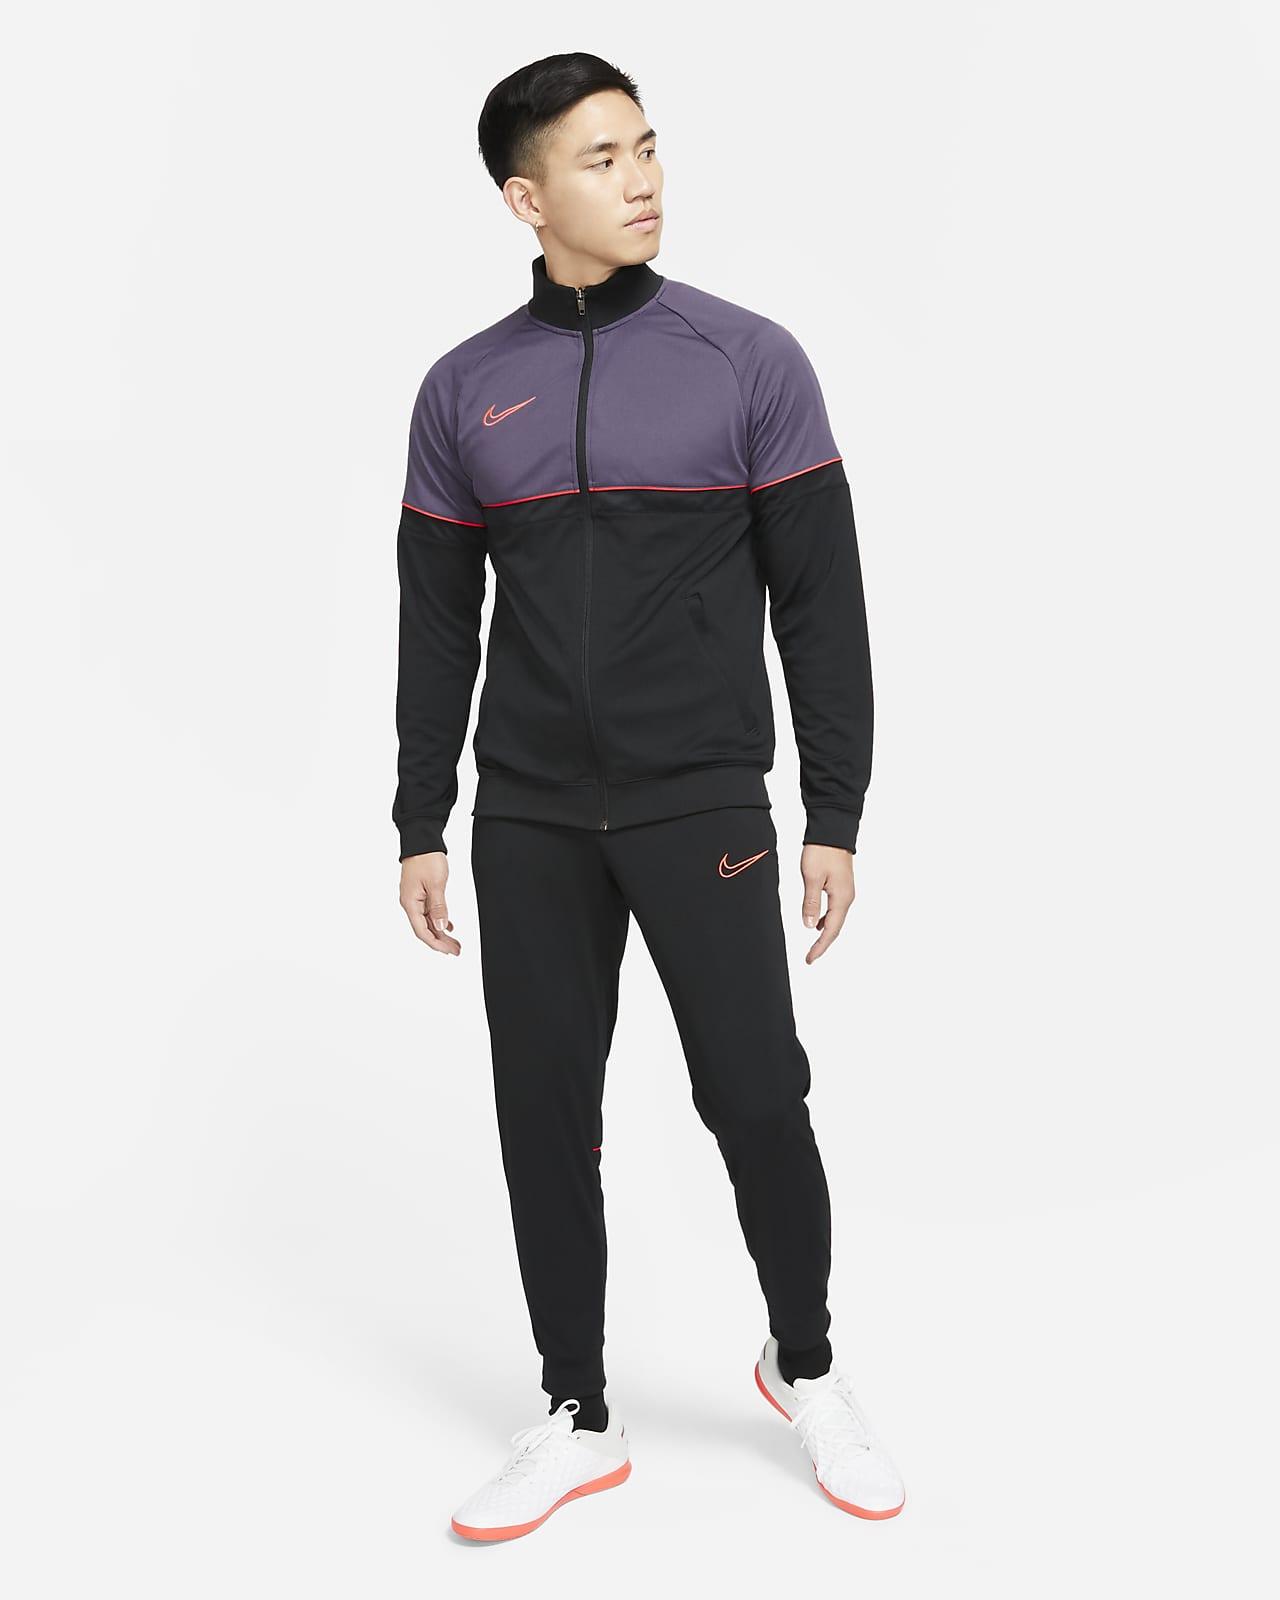 Nike Dri-FIT Academy Men's Soccer Tracksuit